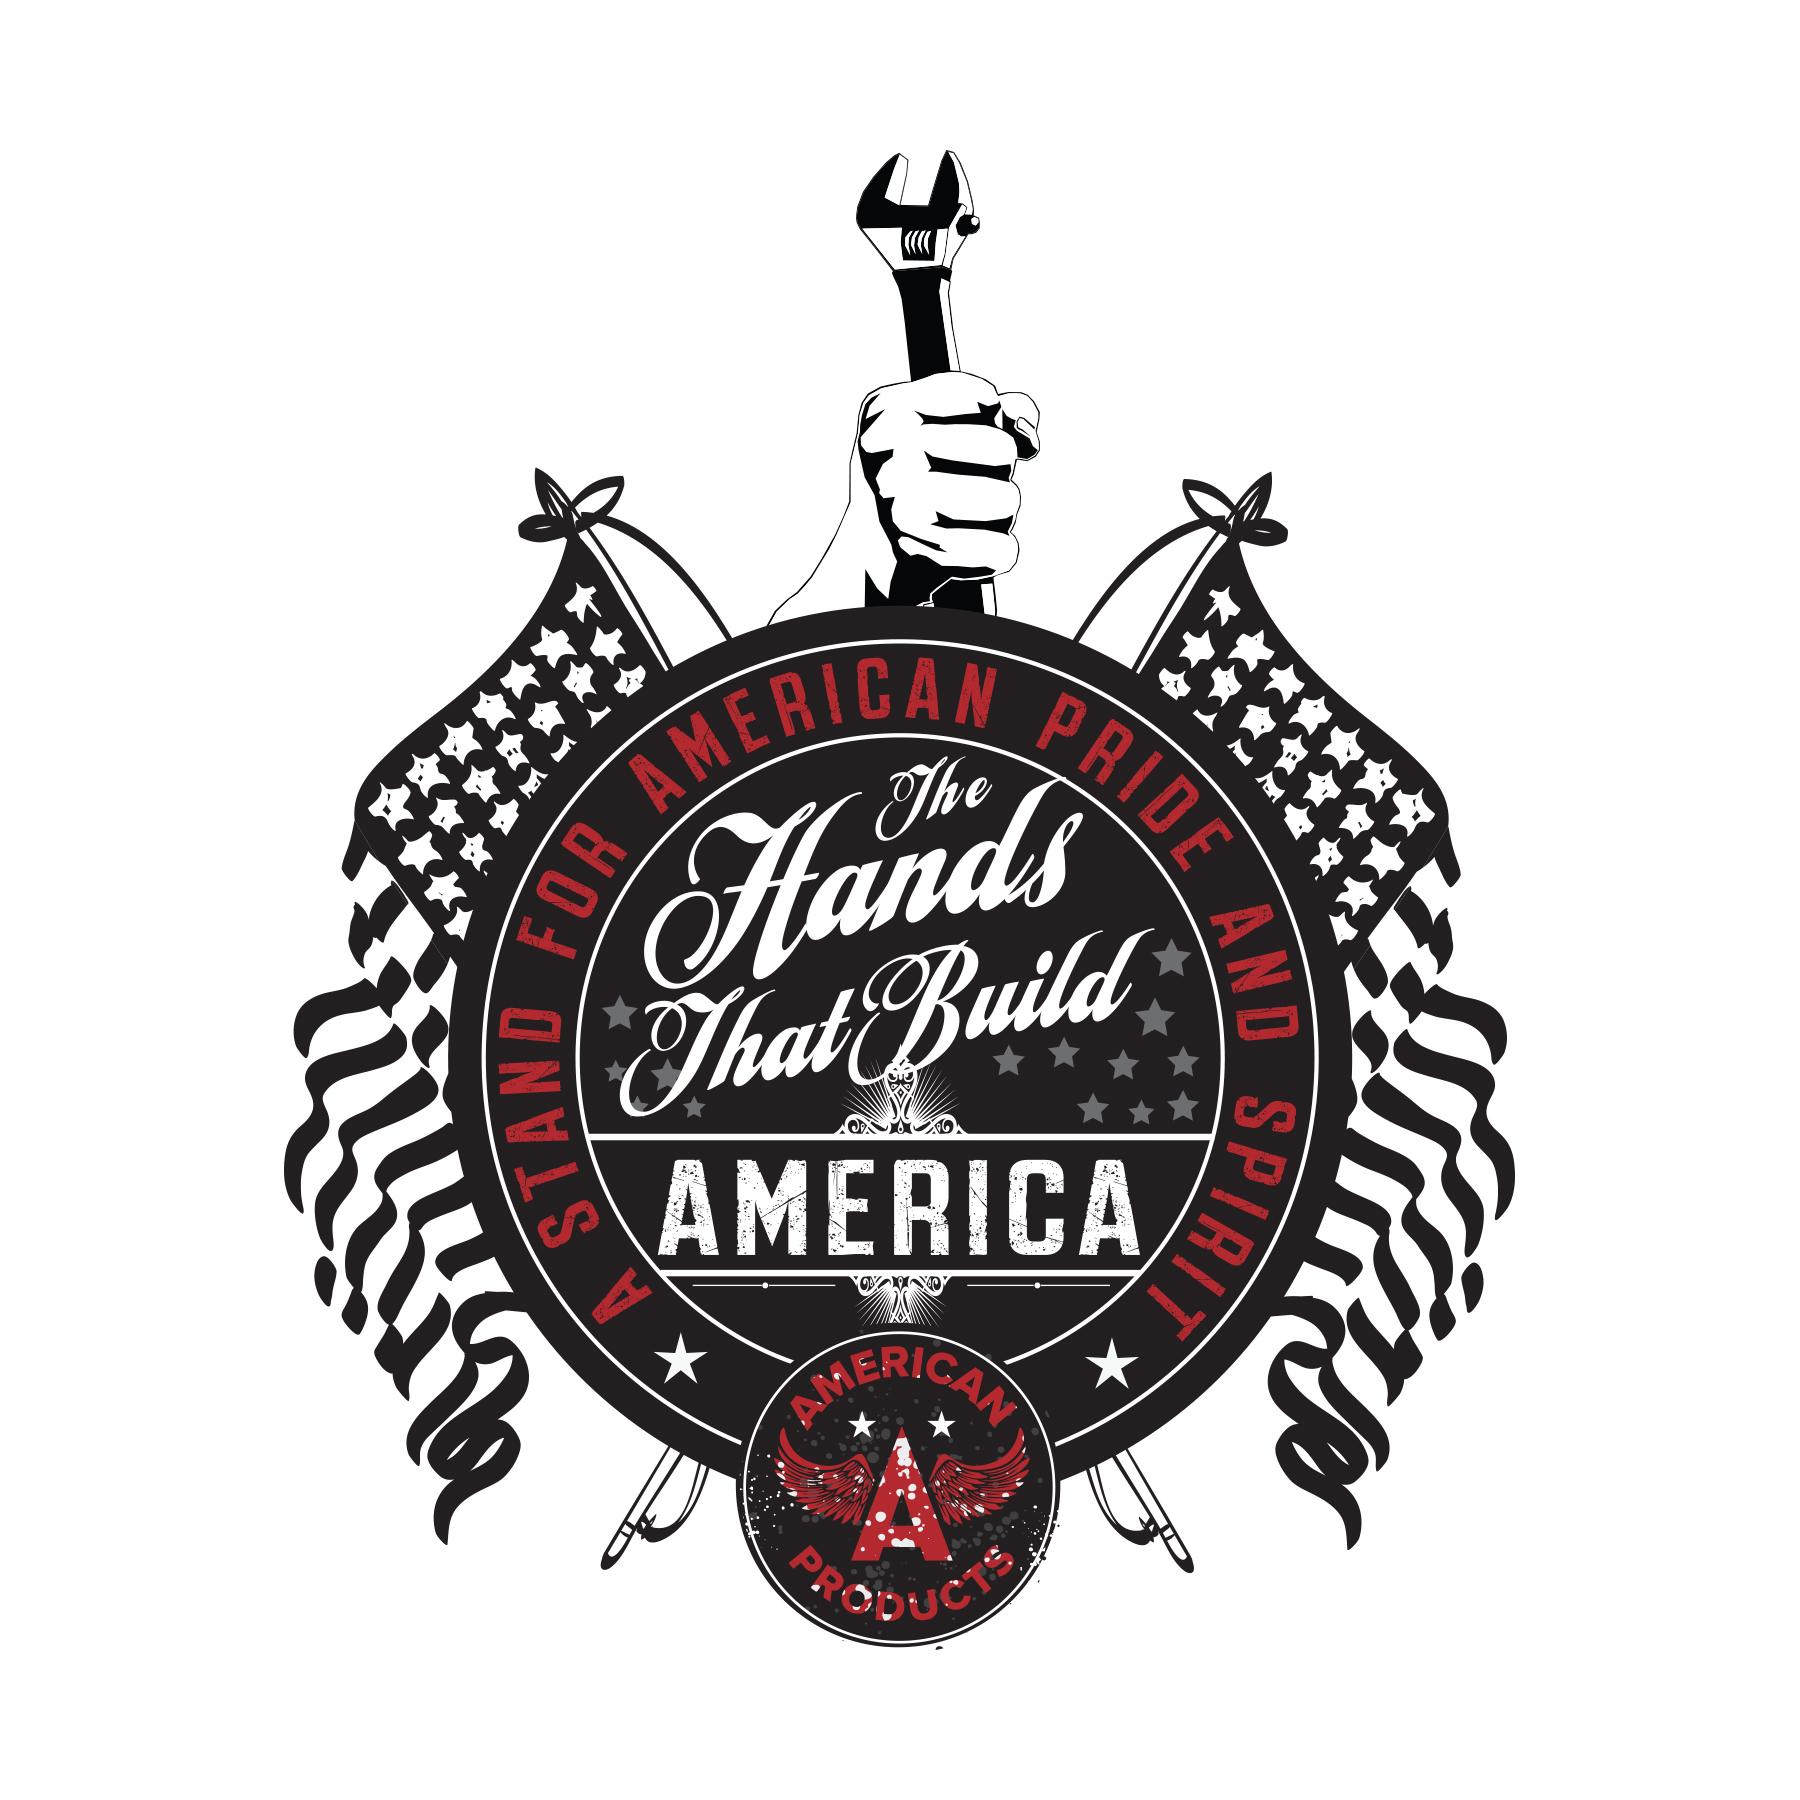 TheHandsThatBuildAmericaLogo.jpg